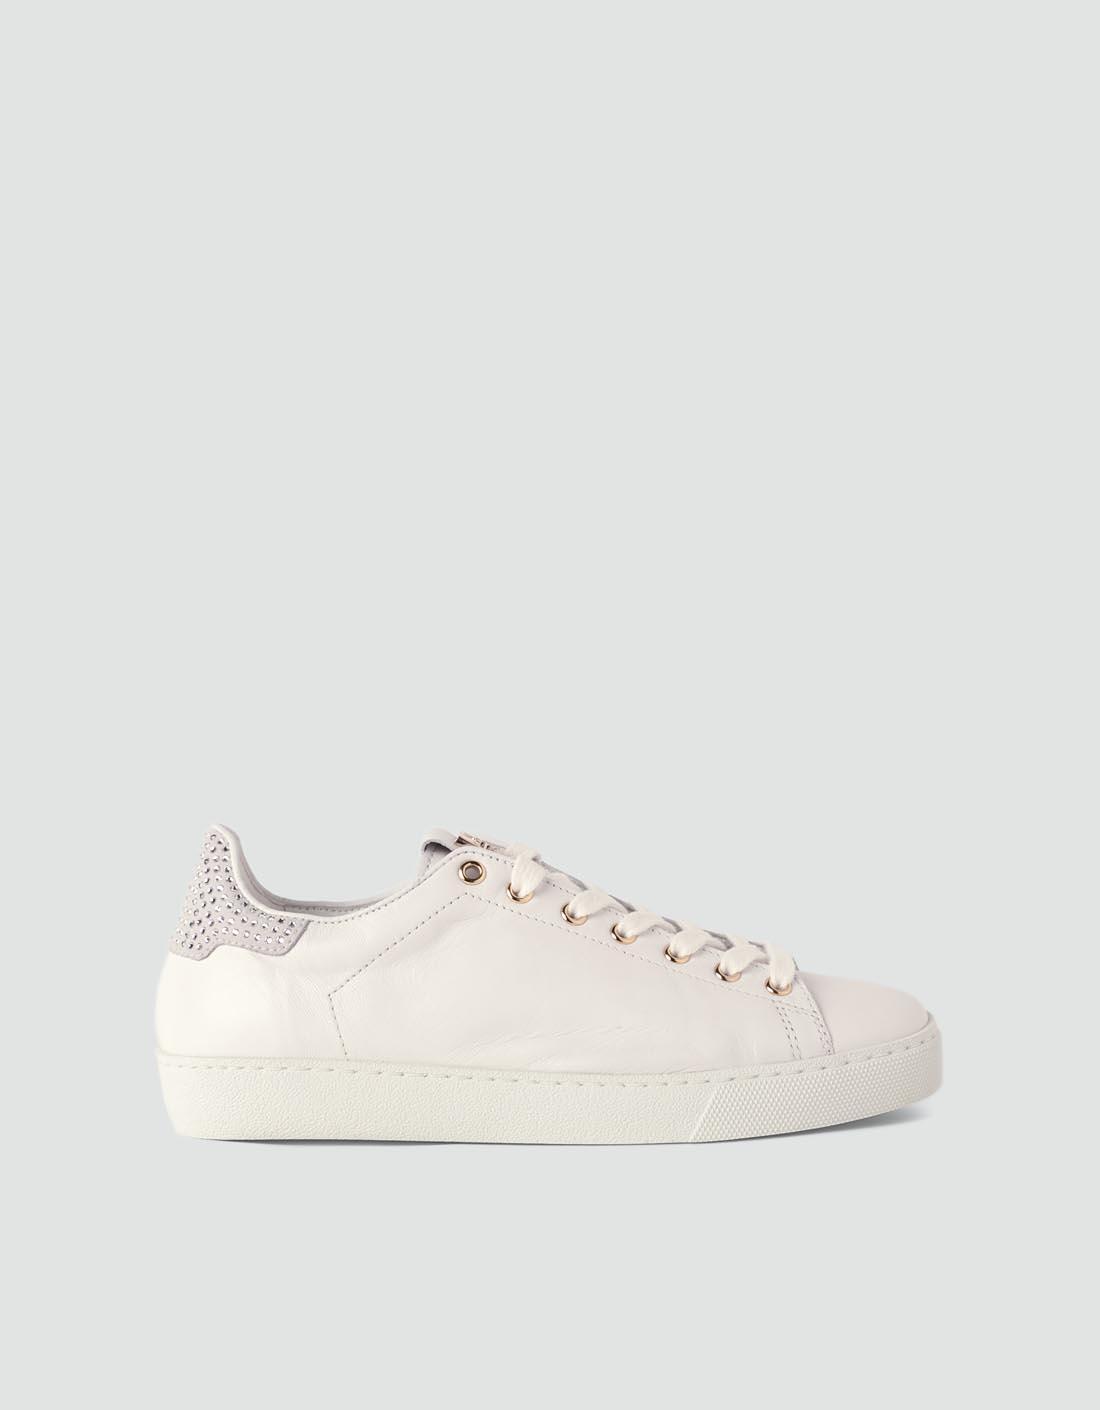 högl Damen Sneaker im Rock-Style schwarz Drop-Shipping Jrbd4zg